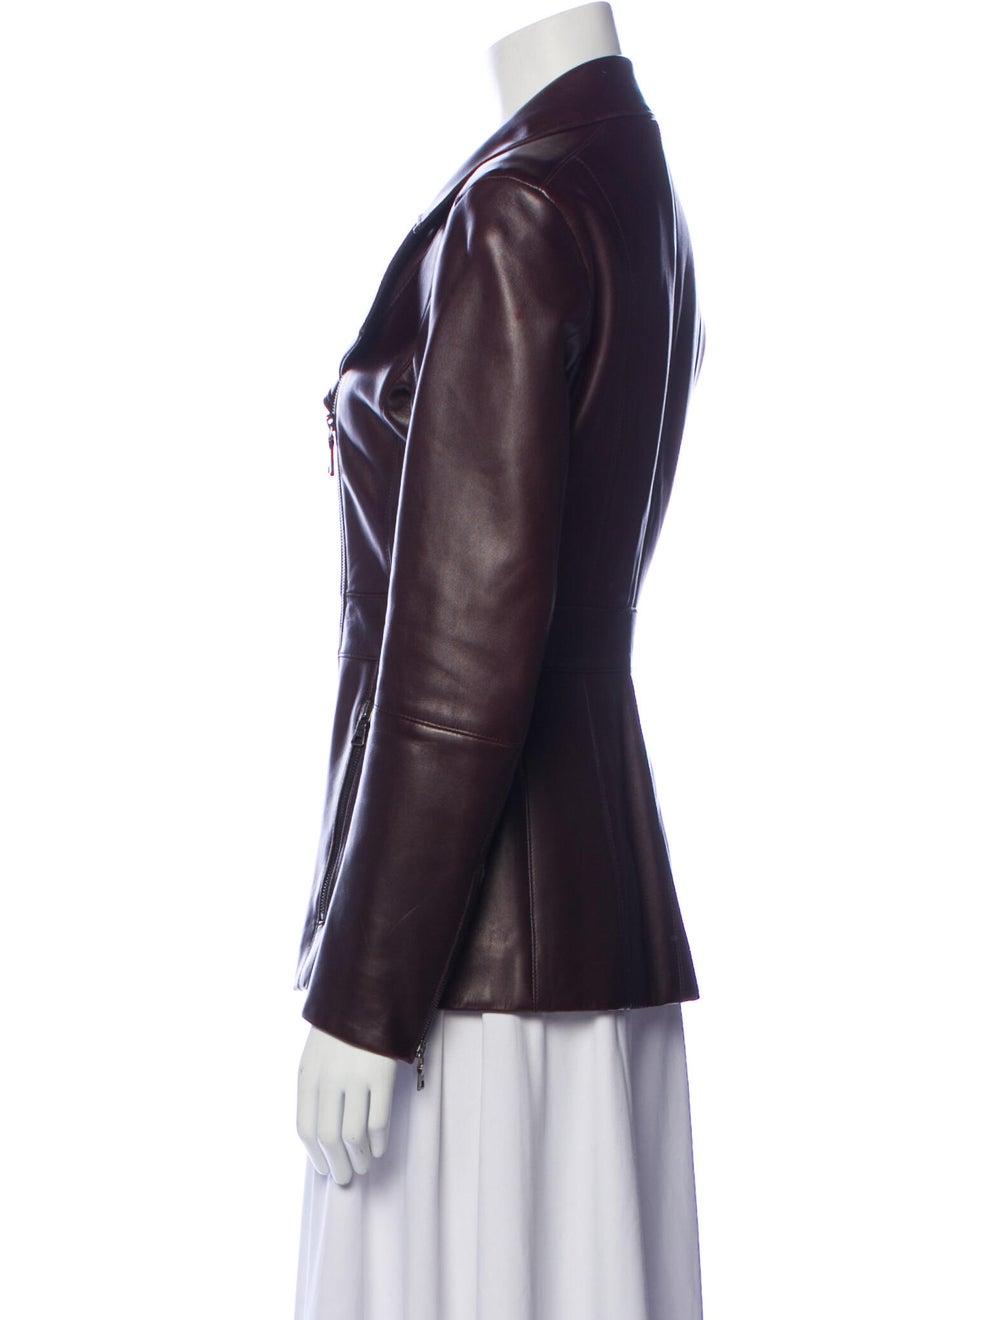 Prada Leather Biker Jacket Brown - image 2